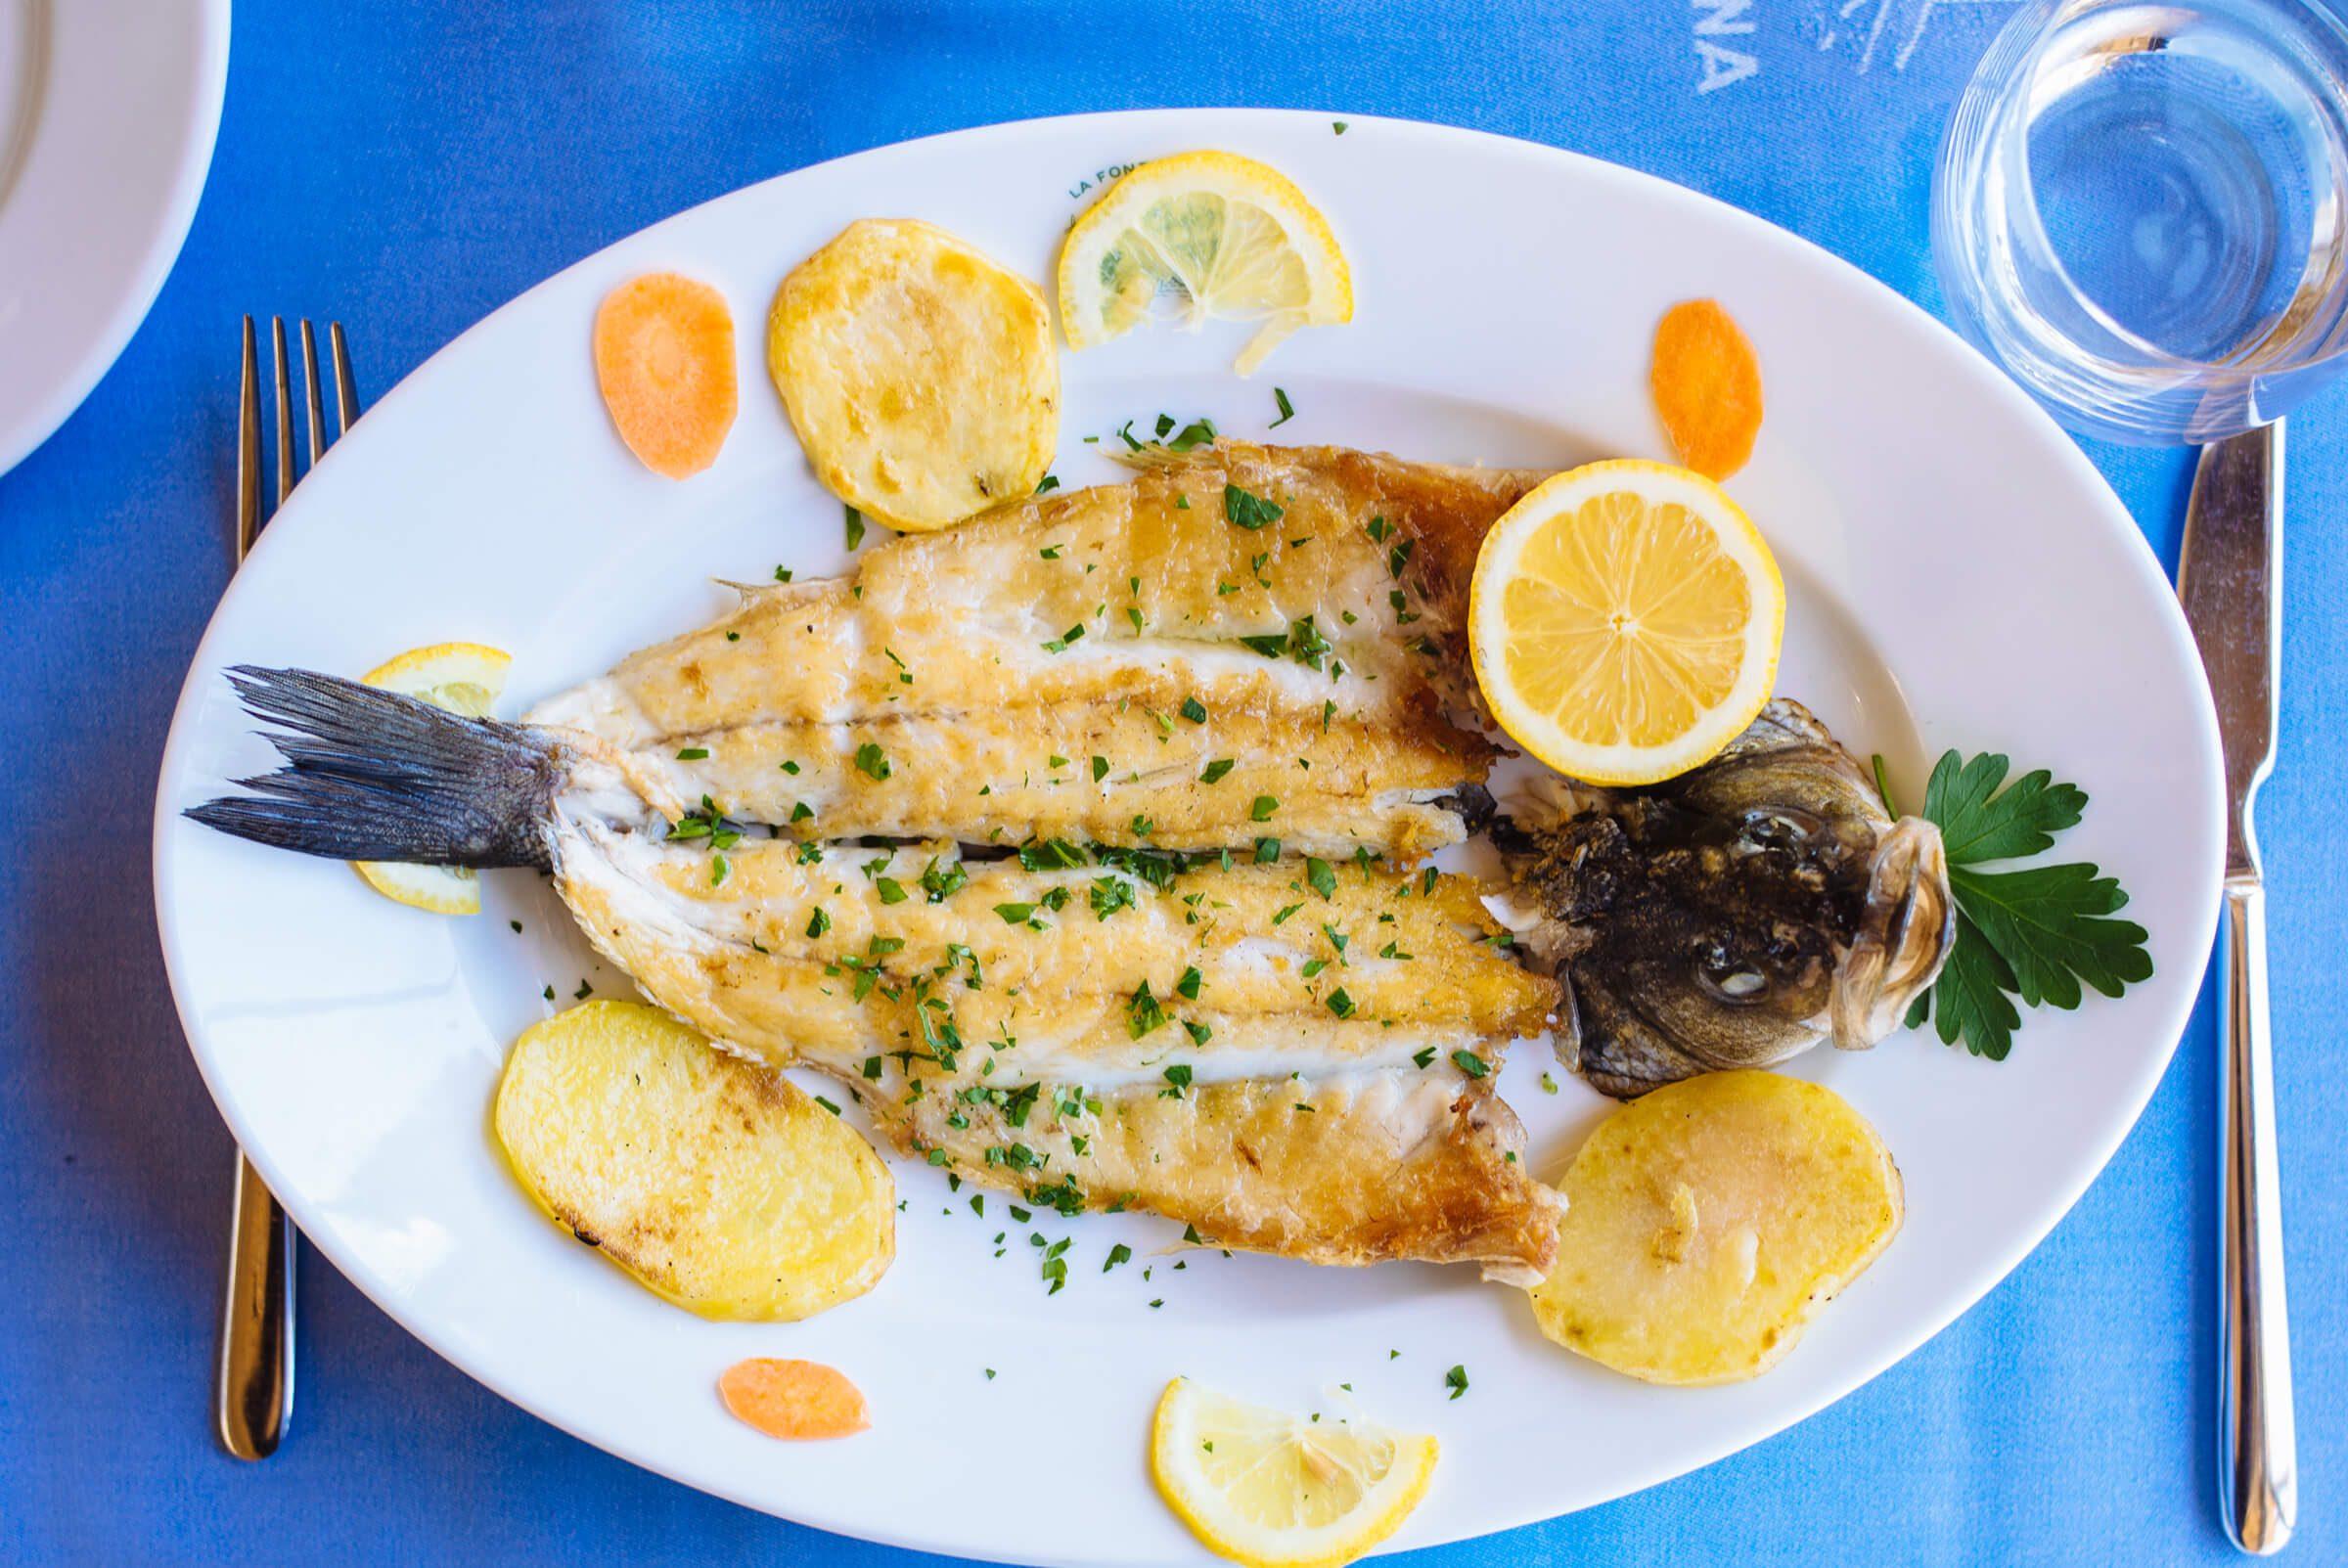 Order local fish dishes and take a boat directly to Ristorante La Fontelina in Capri, Italy, The Taste Edit